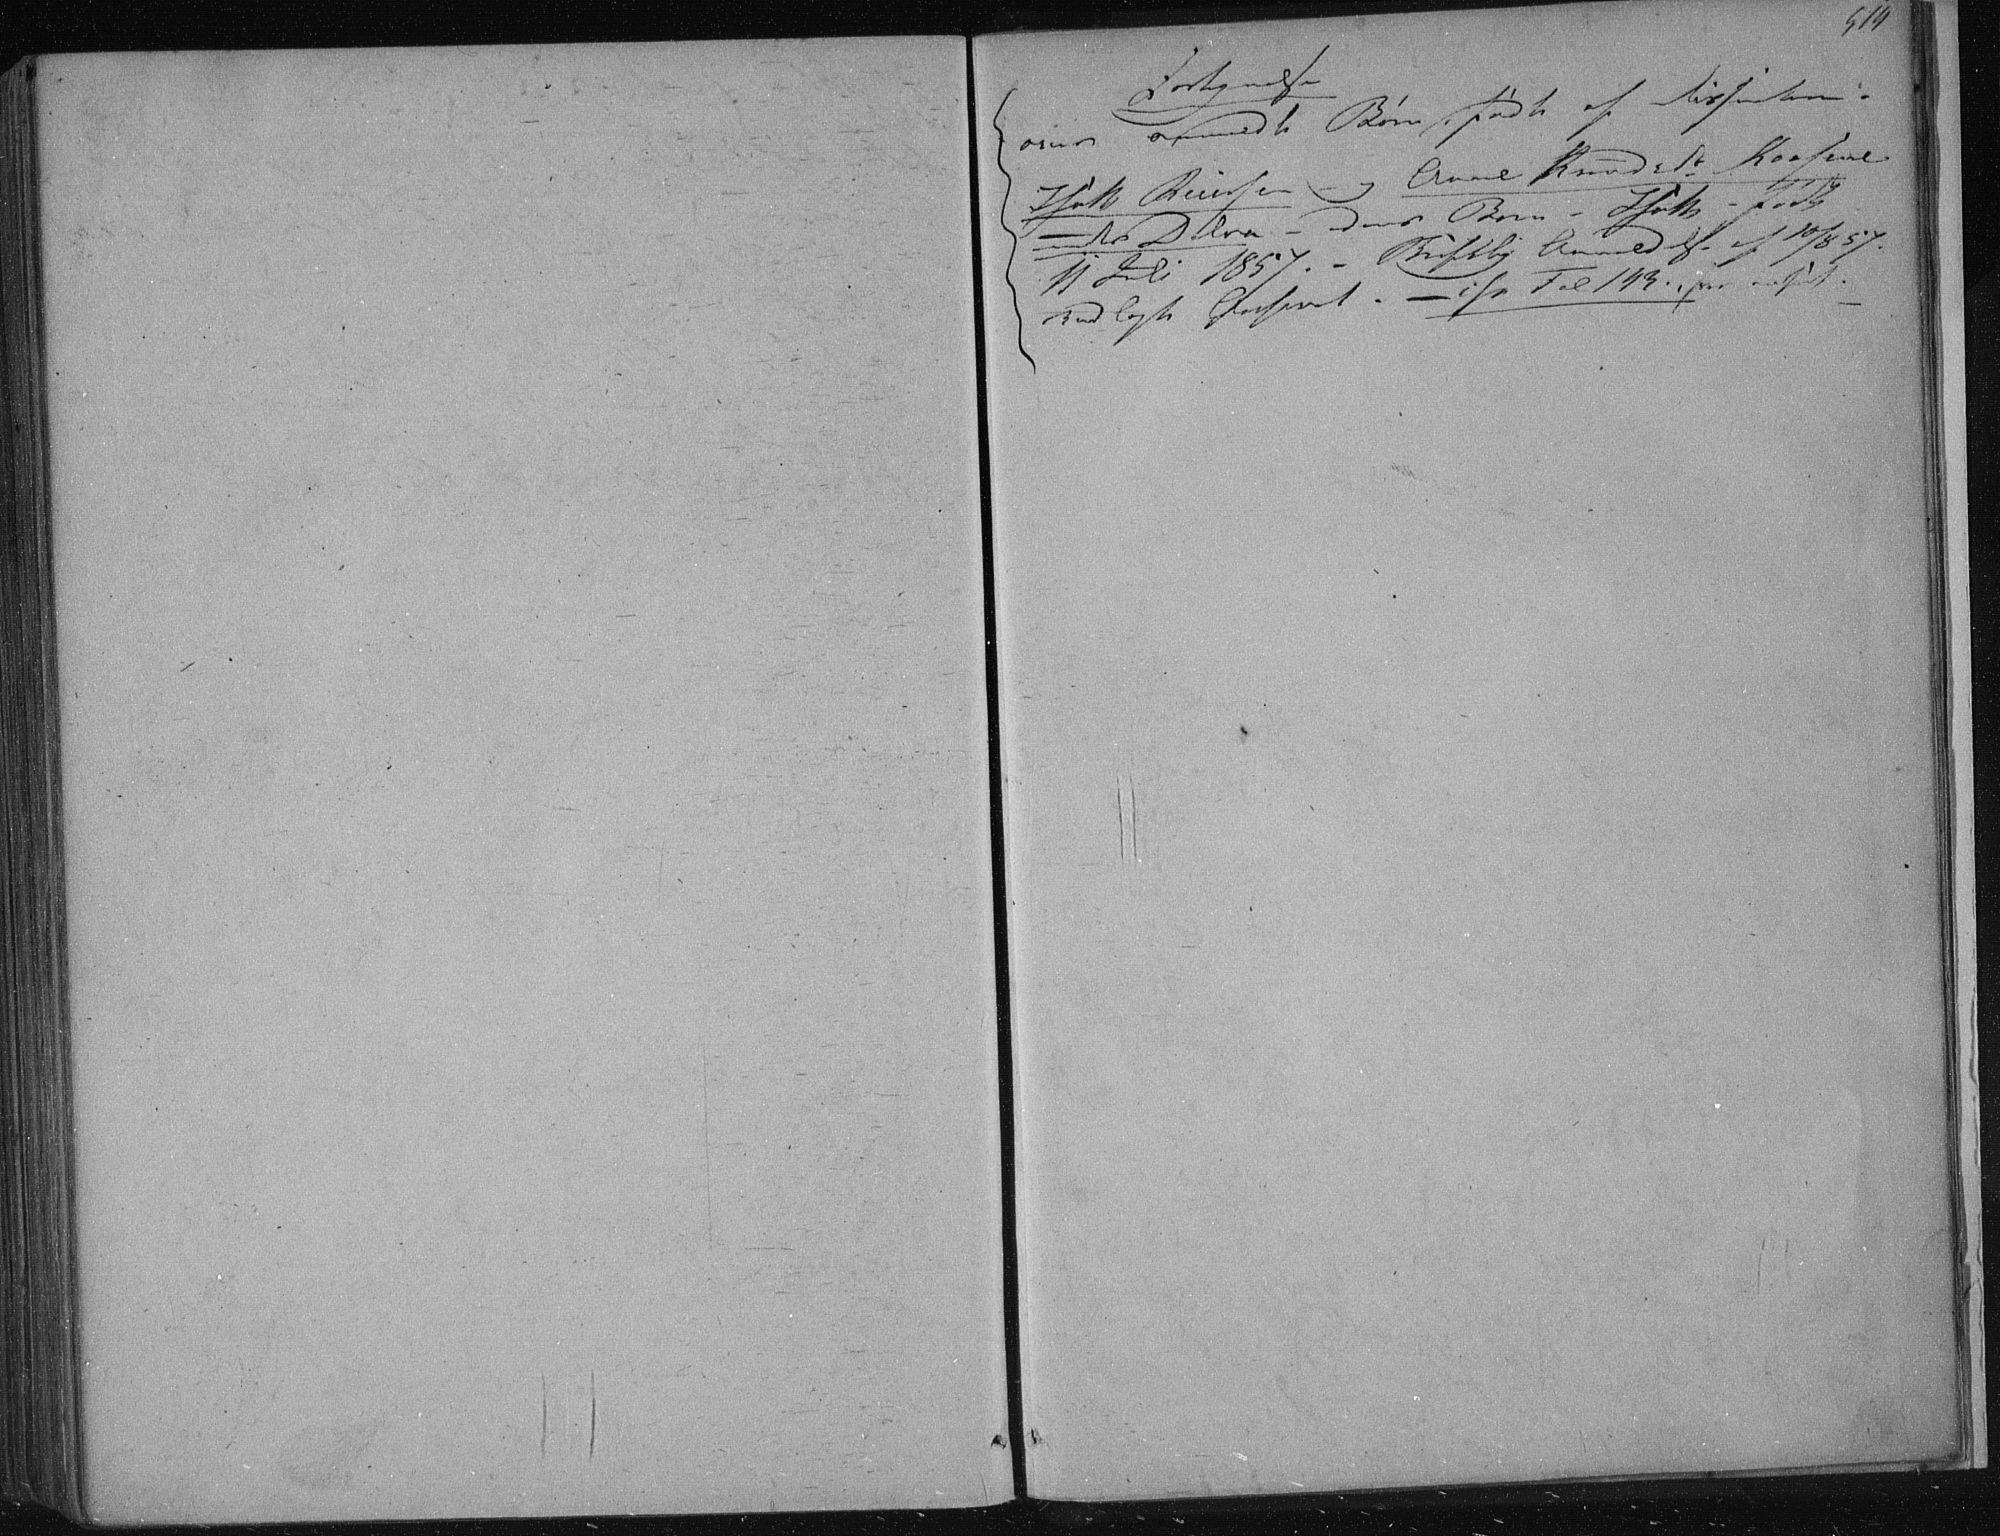 SAKO, Solum kirkebøker, F/Fa/L0007: Ministerialbok nr. I 7, 1856-1864, s. 514